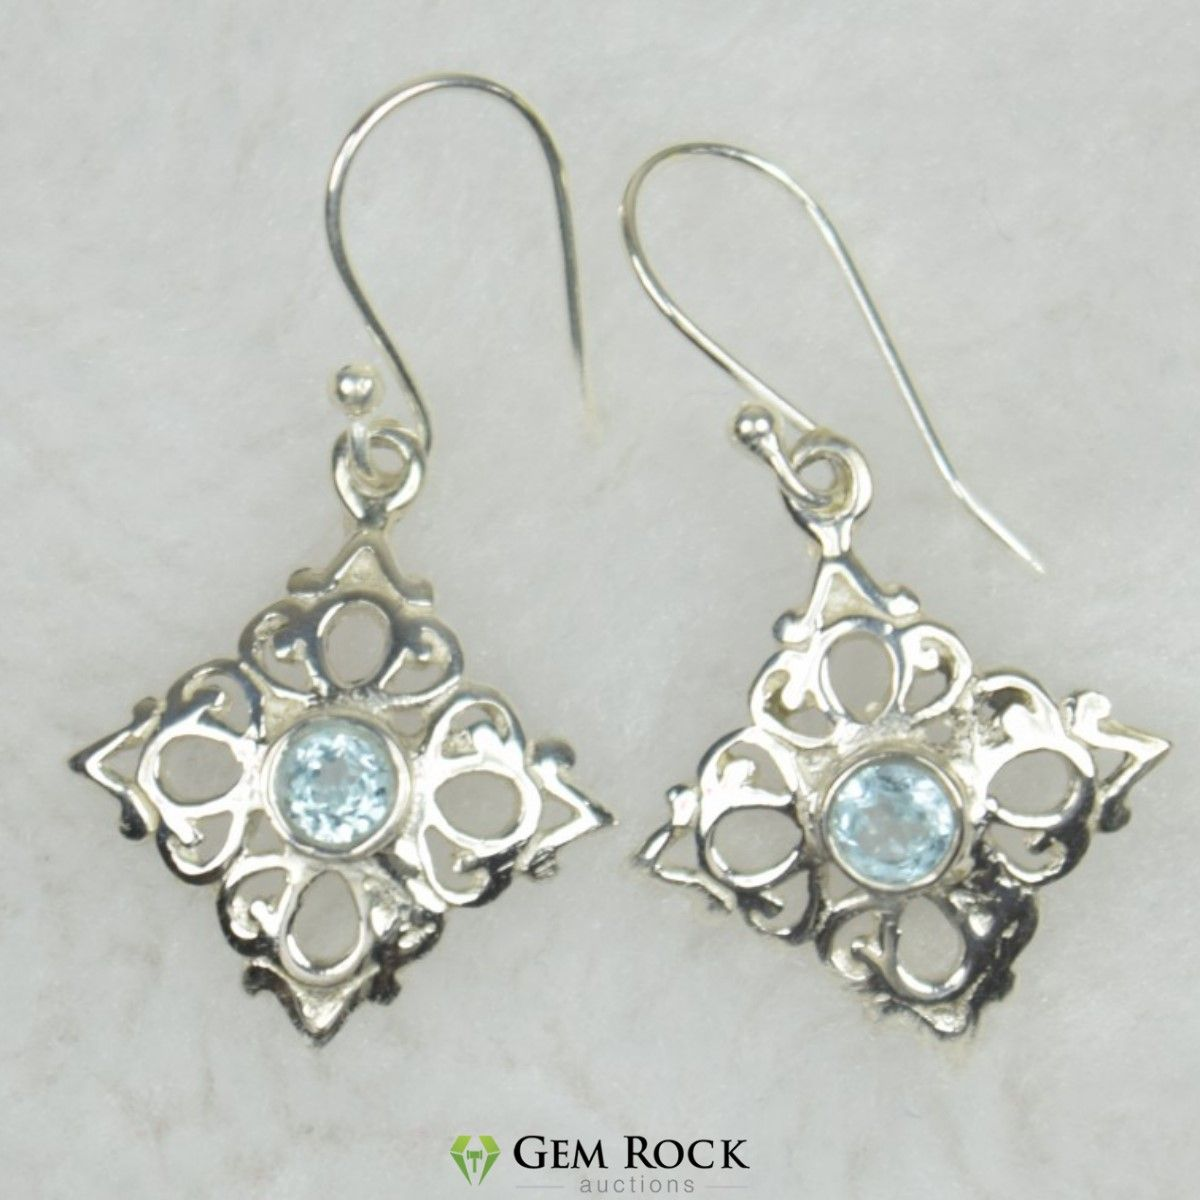 5fd2de851 NATURAL UNTREATED BLUE TOPAZ EARRINGS 925 STERLING SILVER JE Item Code:- JE  559 Gemstone